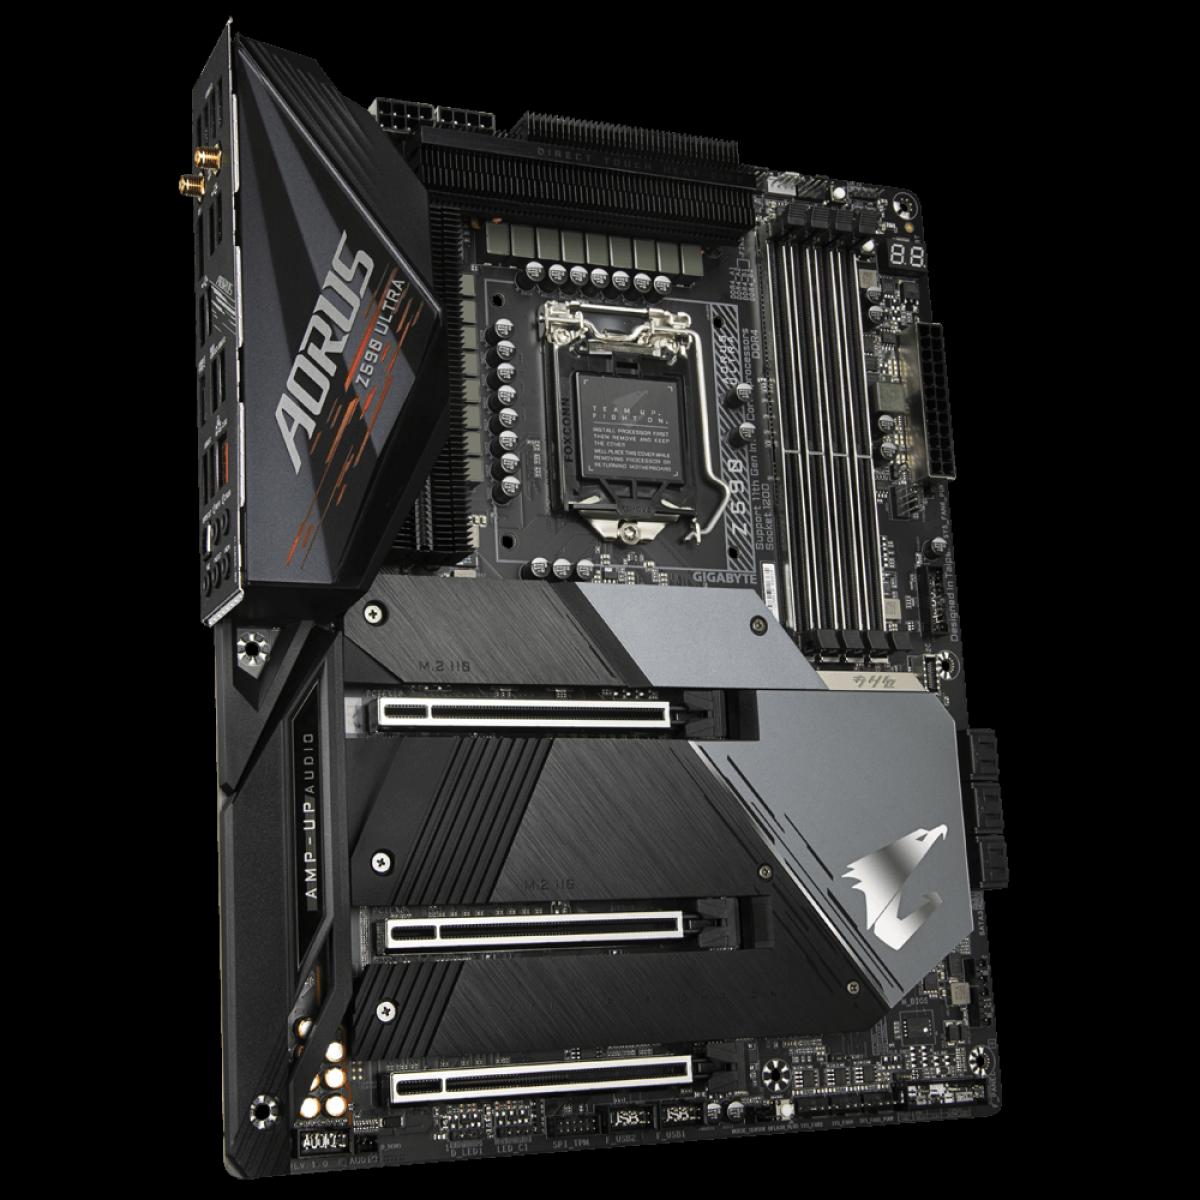 Placa Mãe Gigabyte Z590 AORUS ULTRA, Wi-Fi, Chipset Z590, Intel LGA 1200, ATX, DDR4